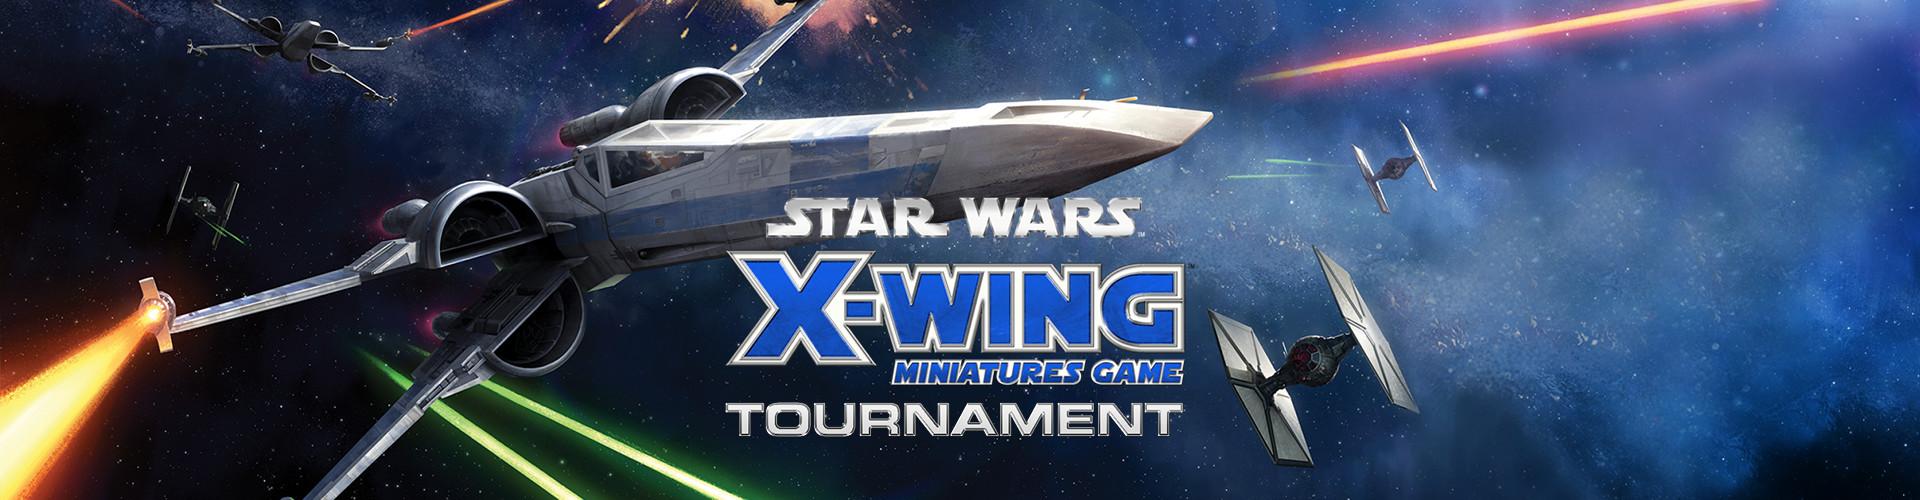 TNM 01 xwing turnier - Turnier: STAR WARS X-Wing